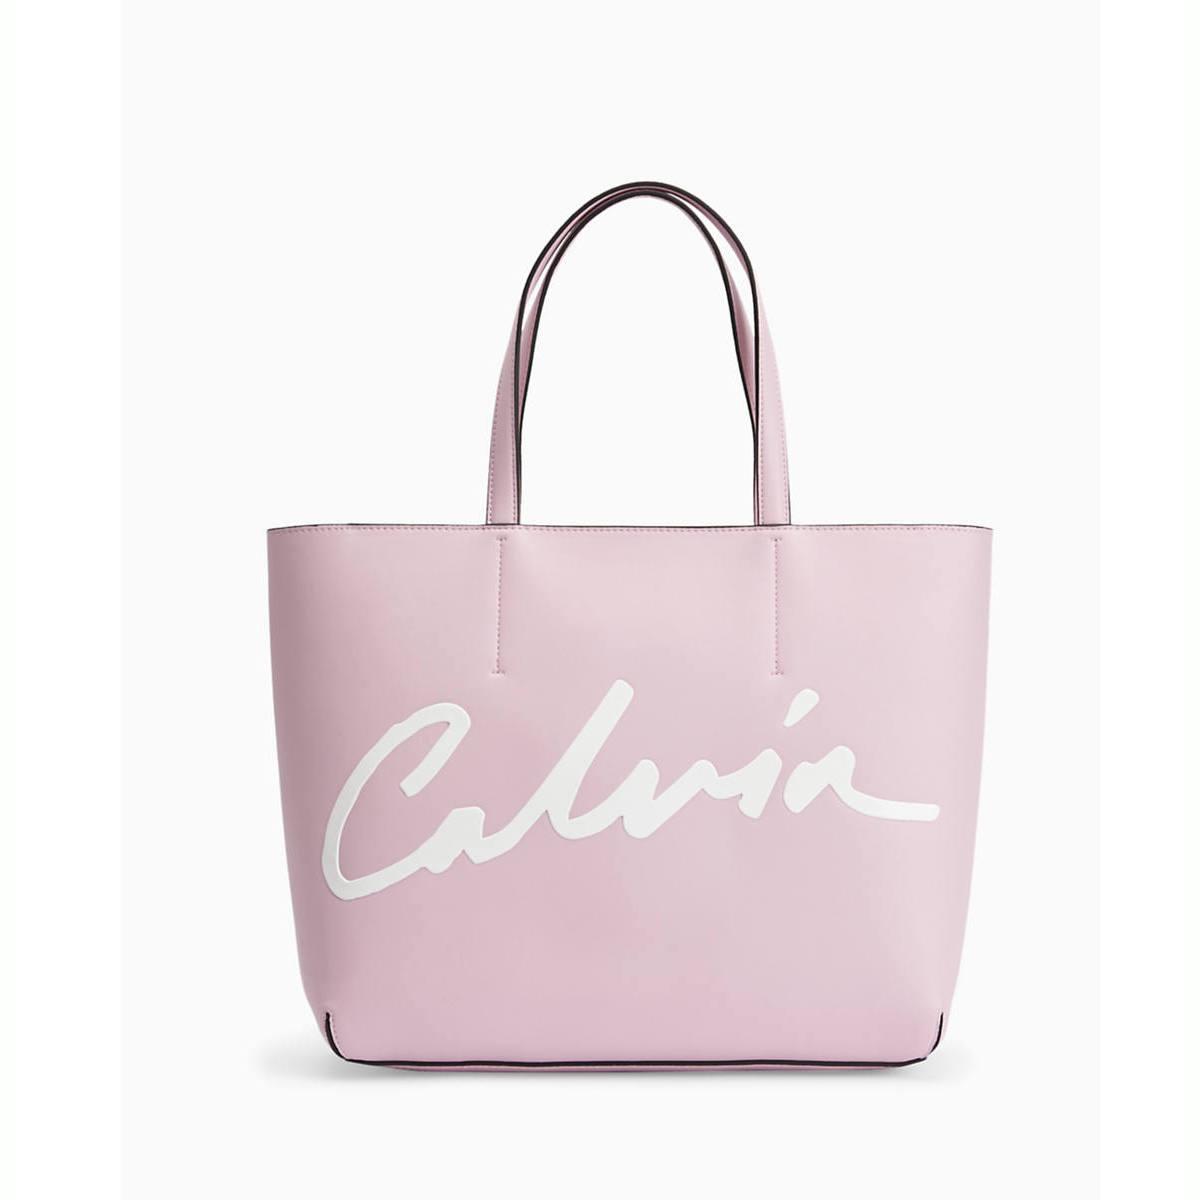 Calvin Klein Jeans|Sculpted Shopper